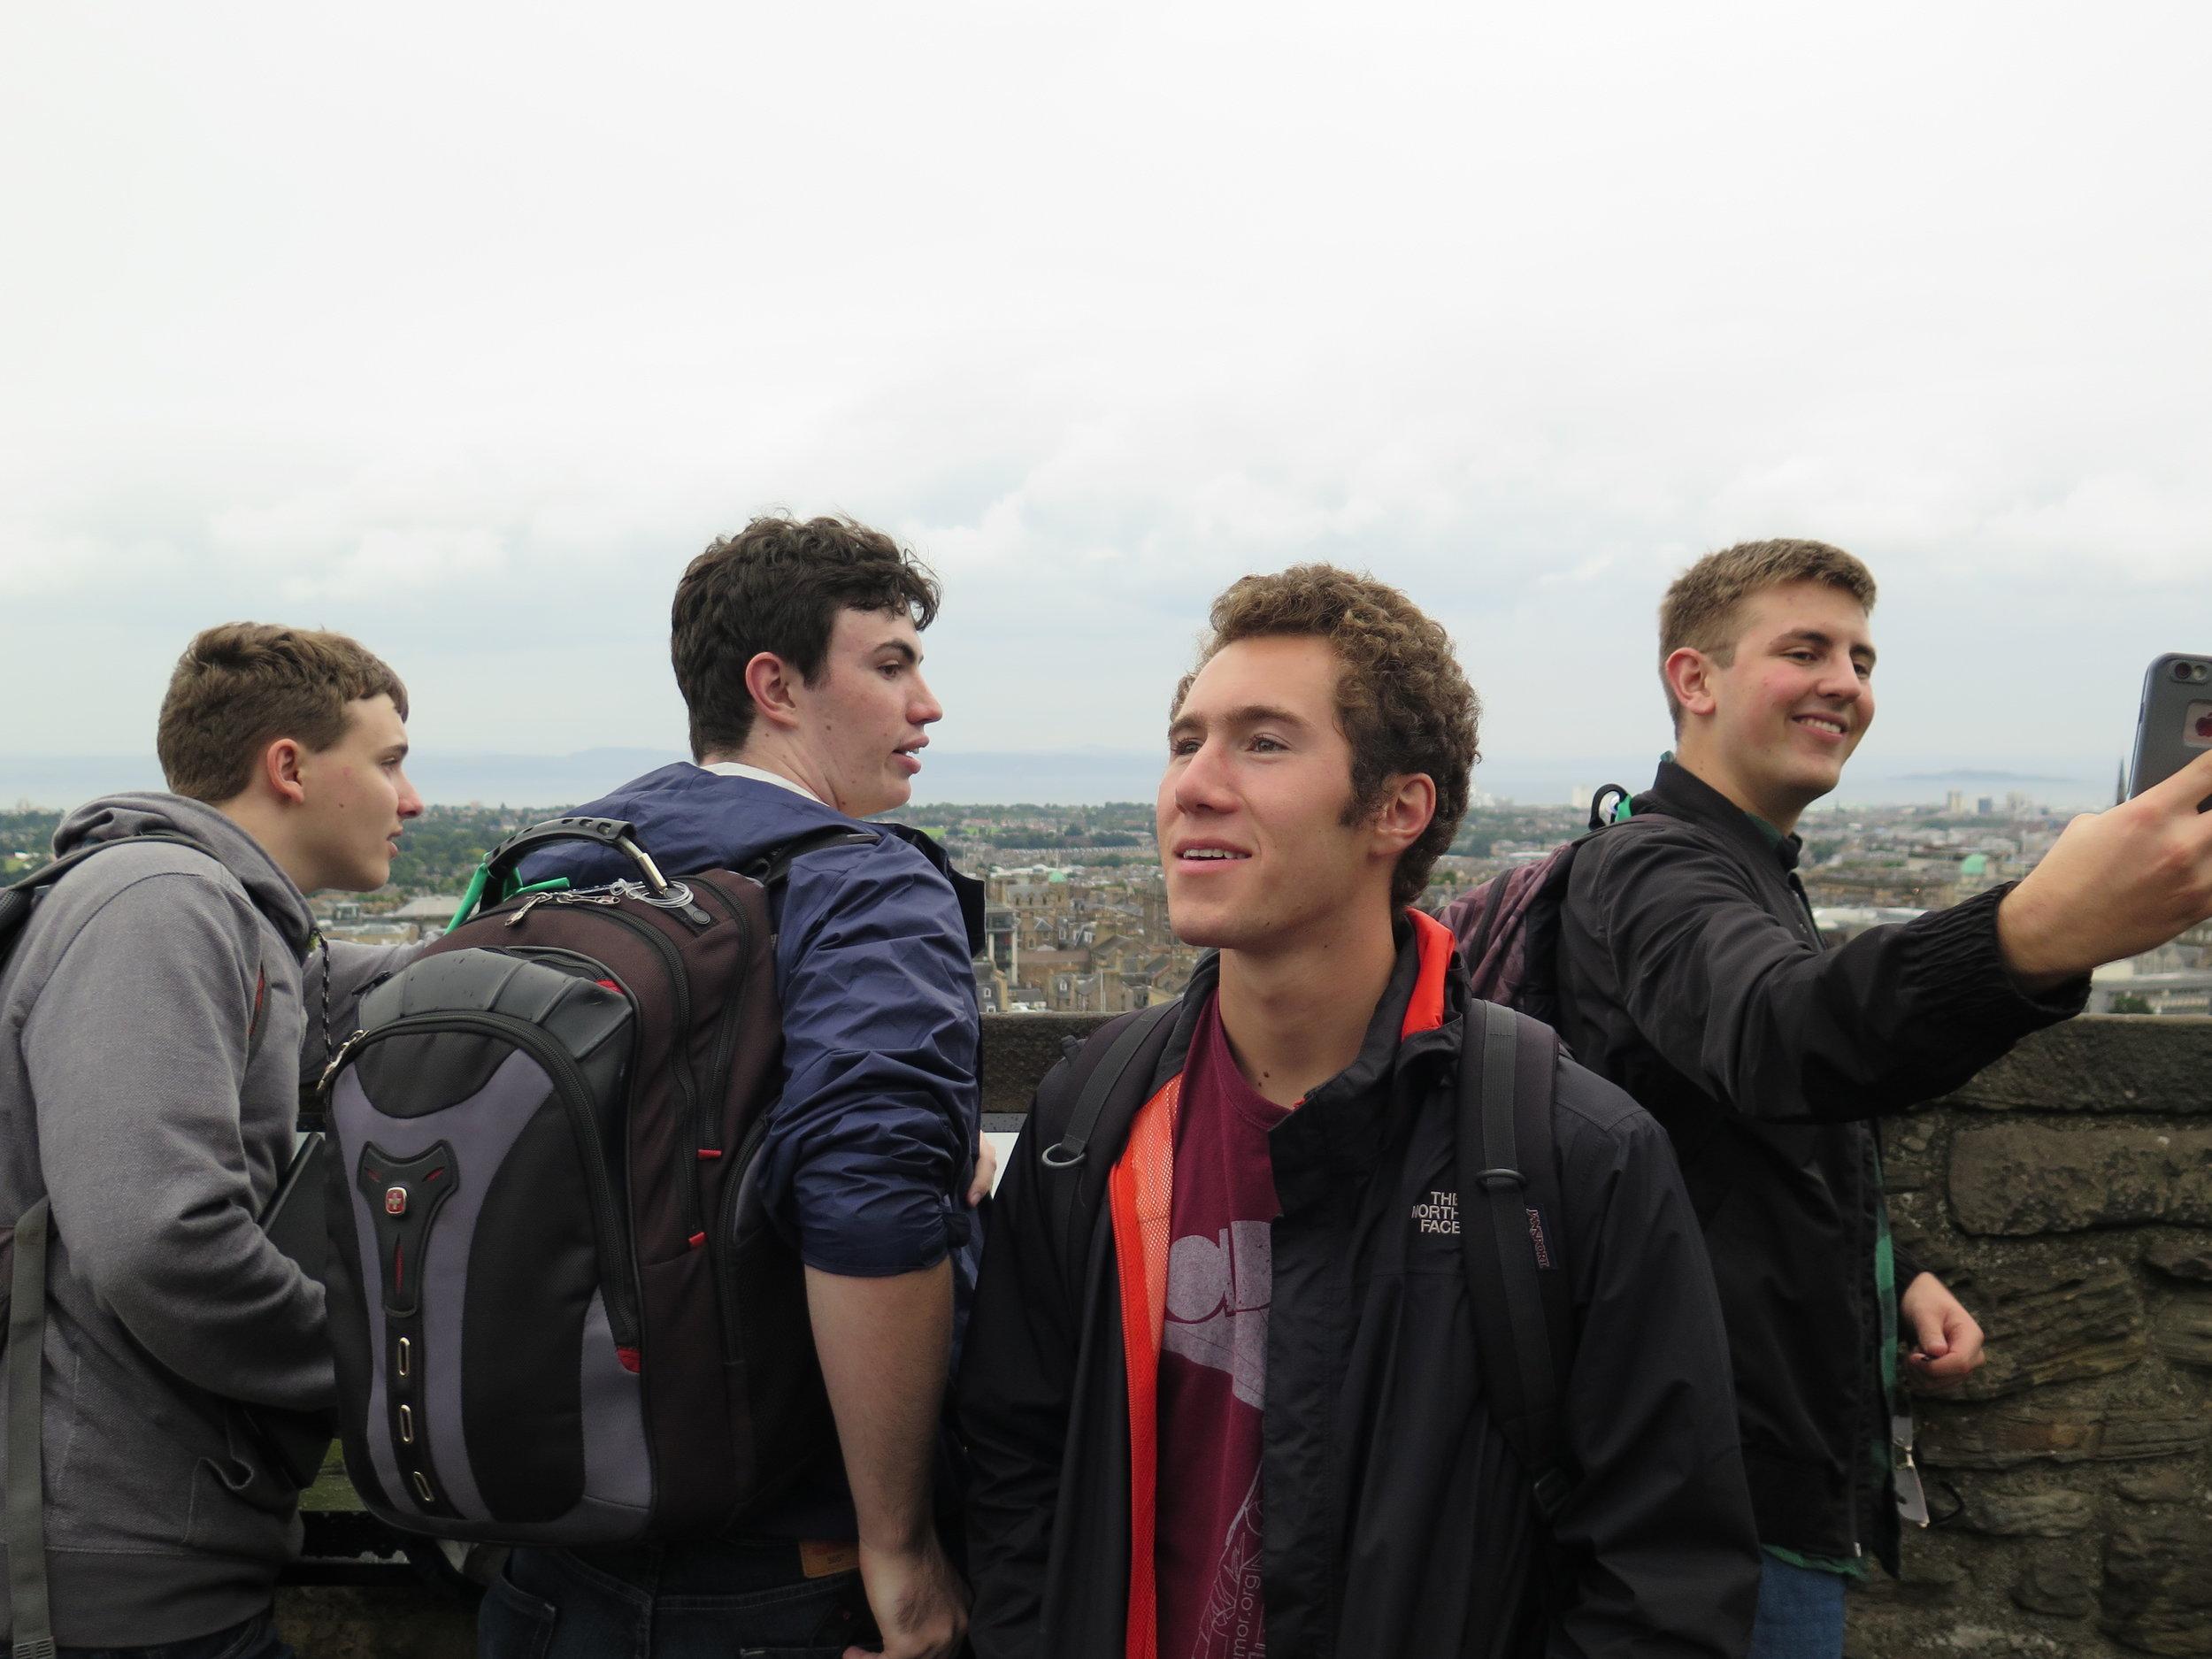 The guys enjoying the sights of Edinburgh Castle